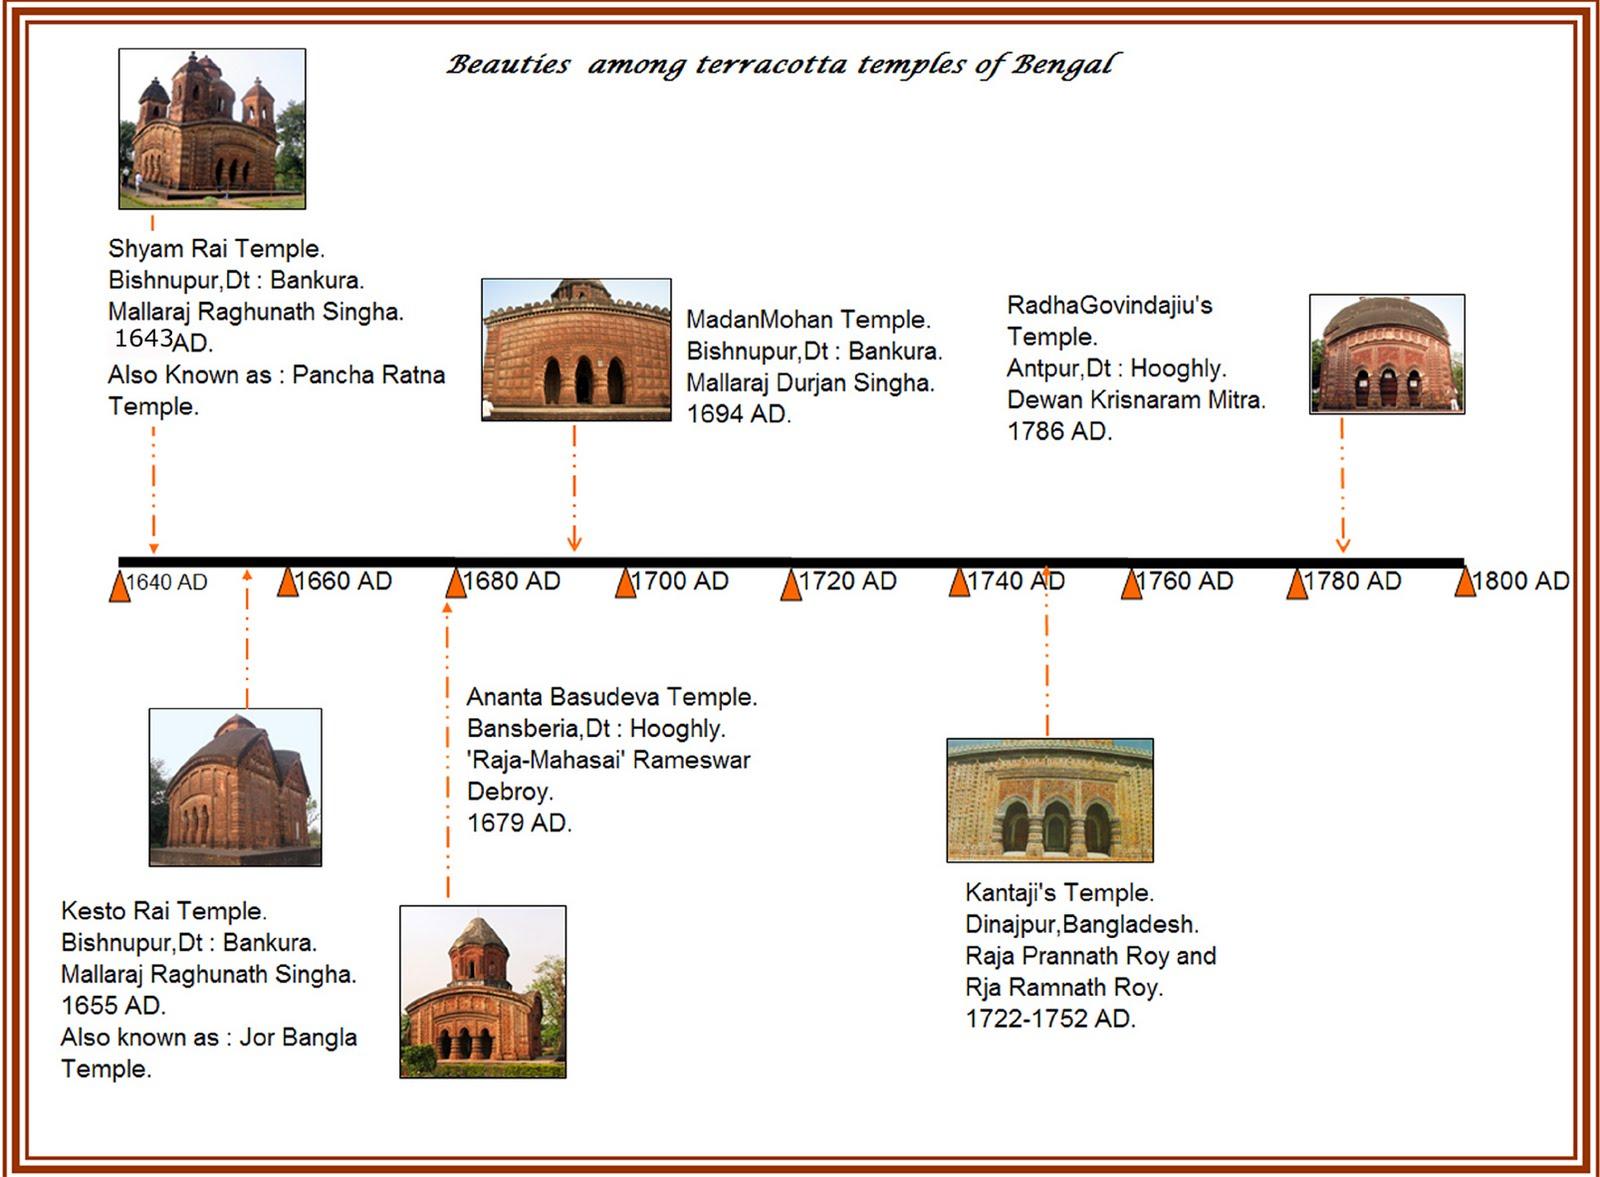 terra cotta temples of bengal timeline of six beauties among terra